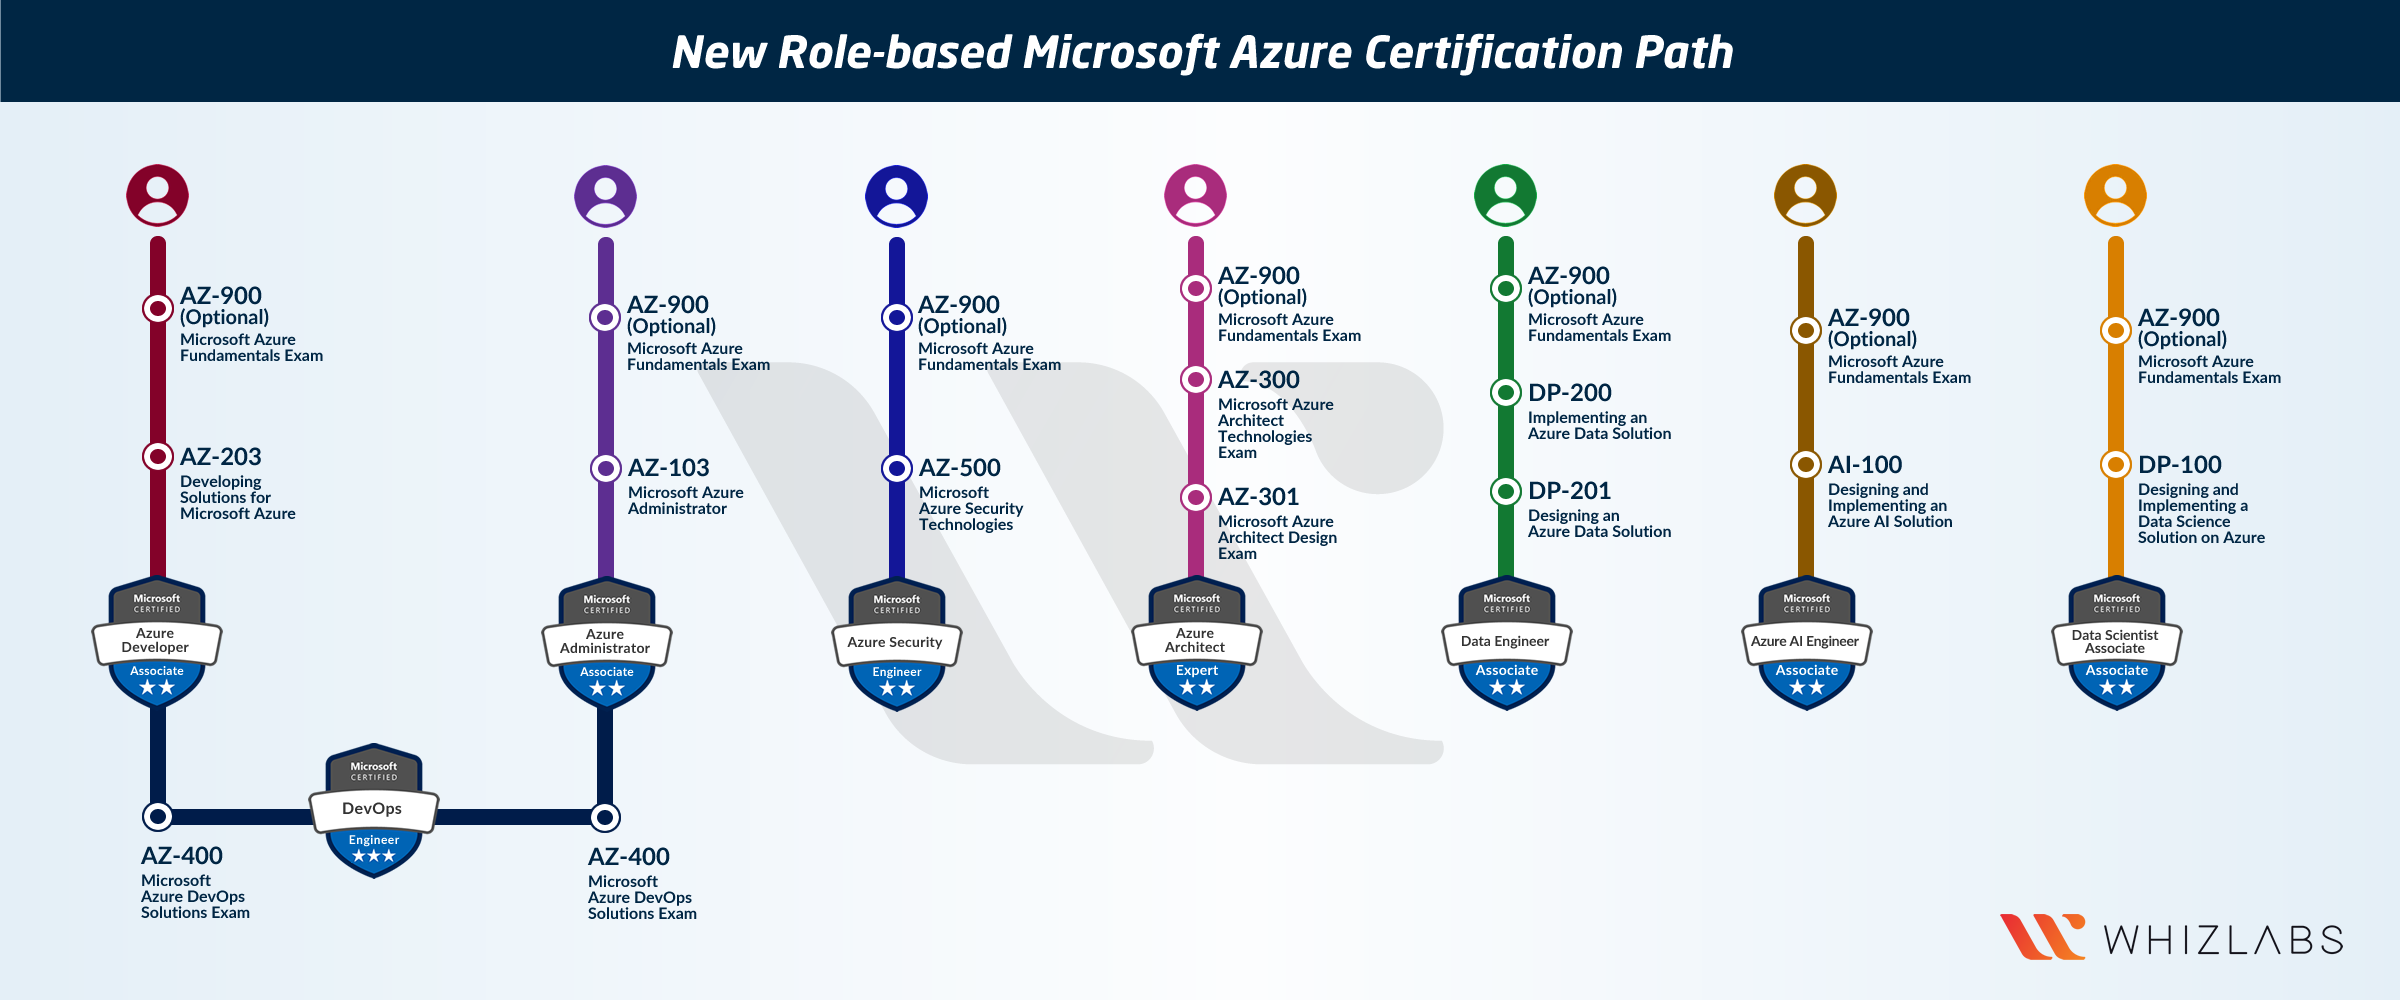 azure certifications microsoft whizlabs path certification fundamentals 900 az exam based medium role feedback updated